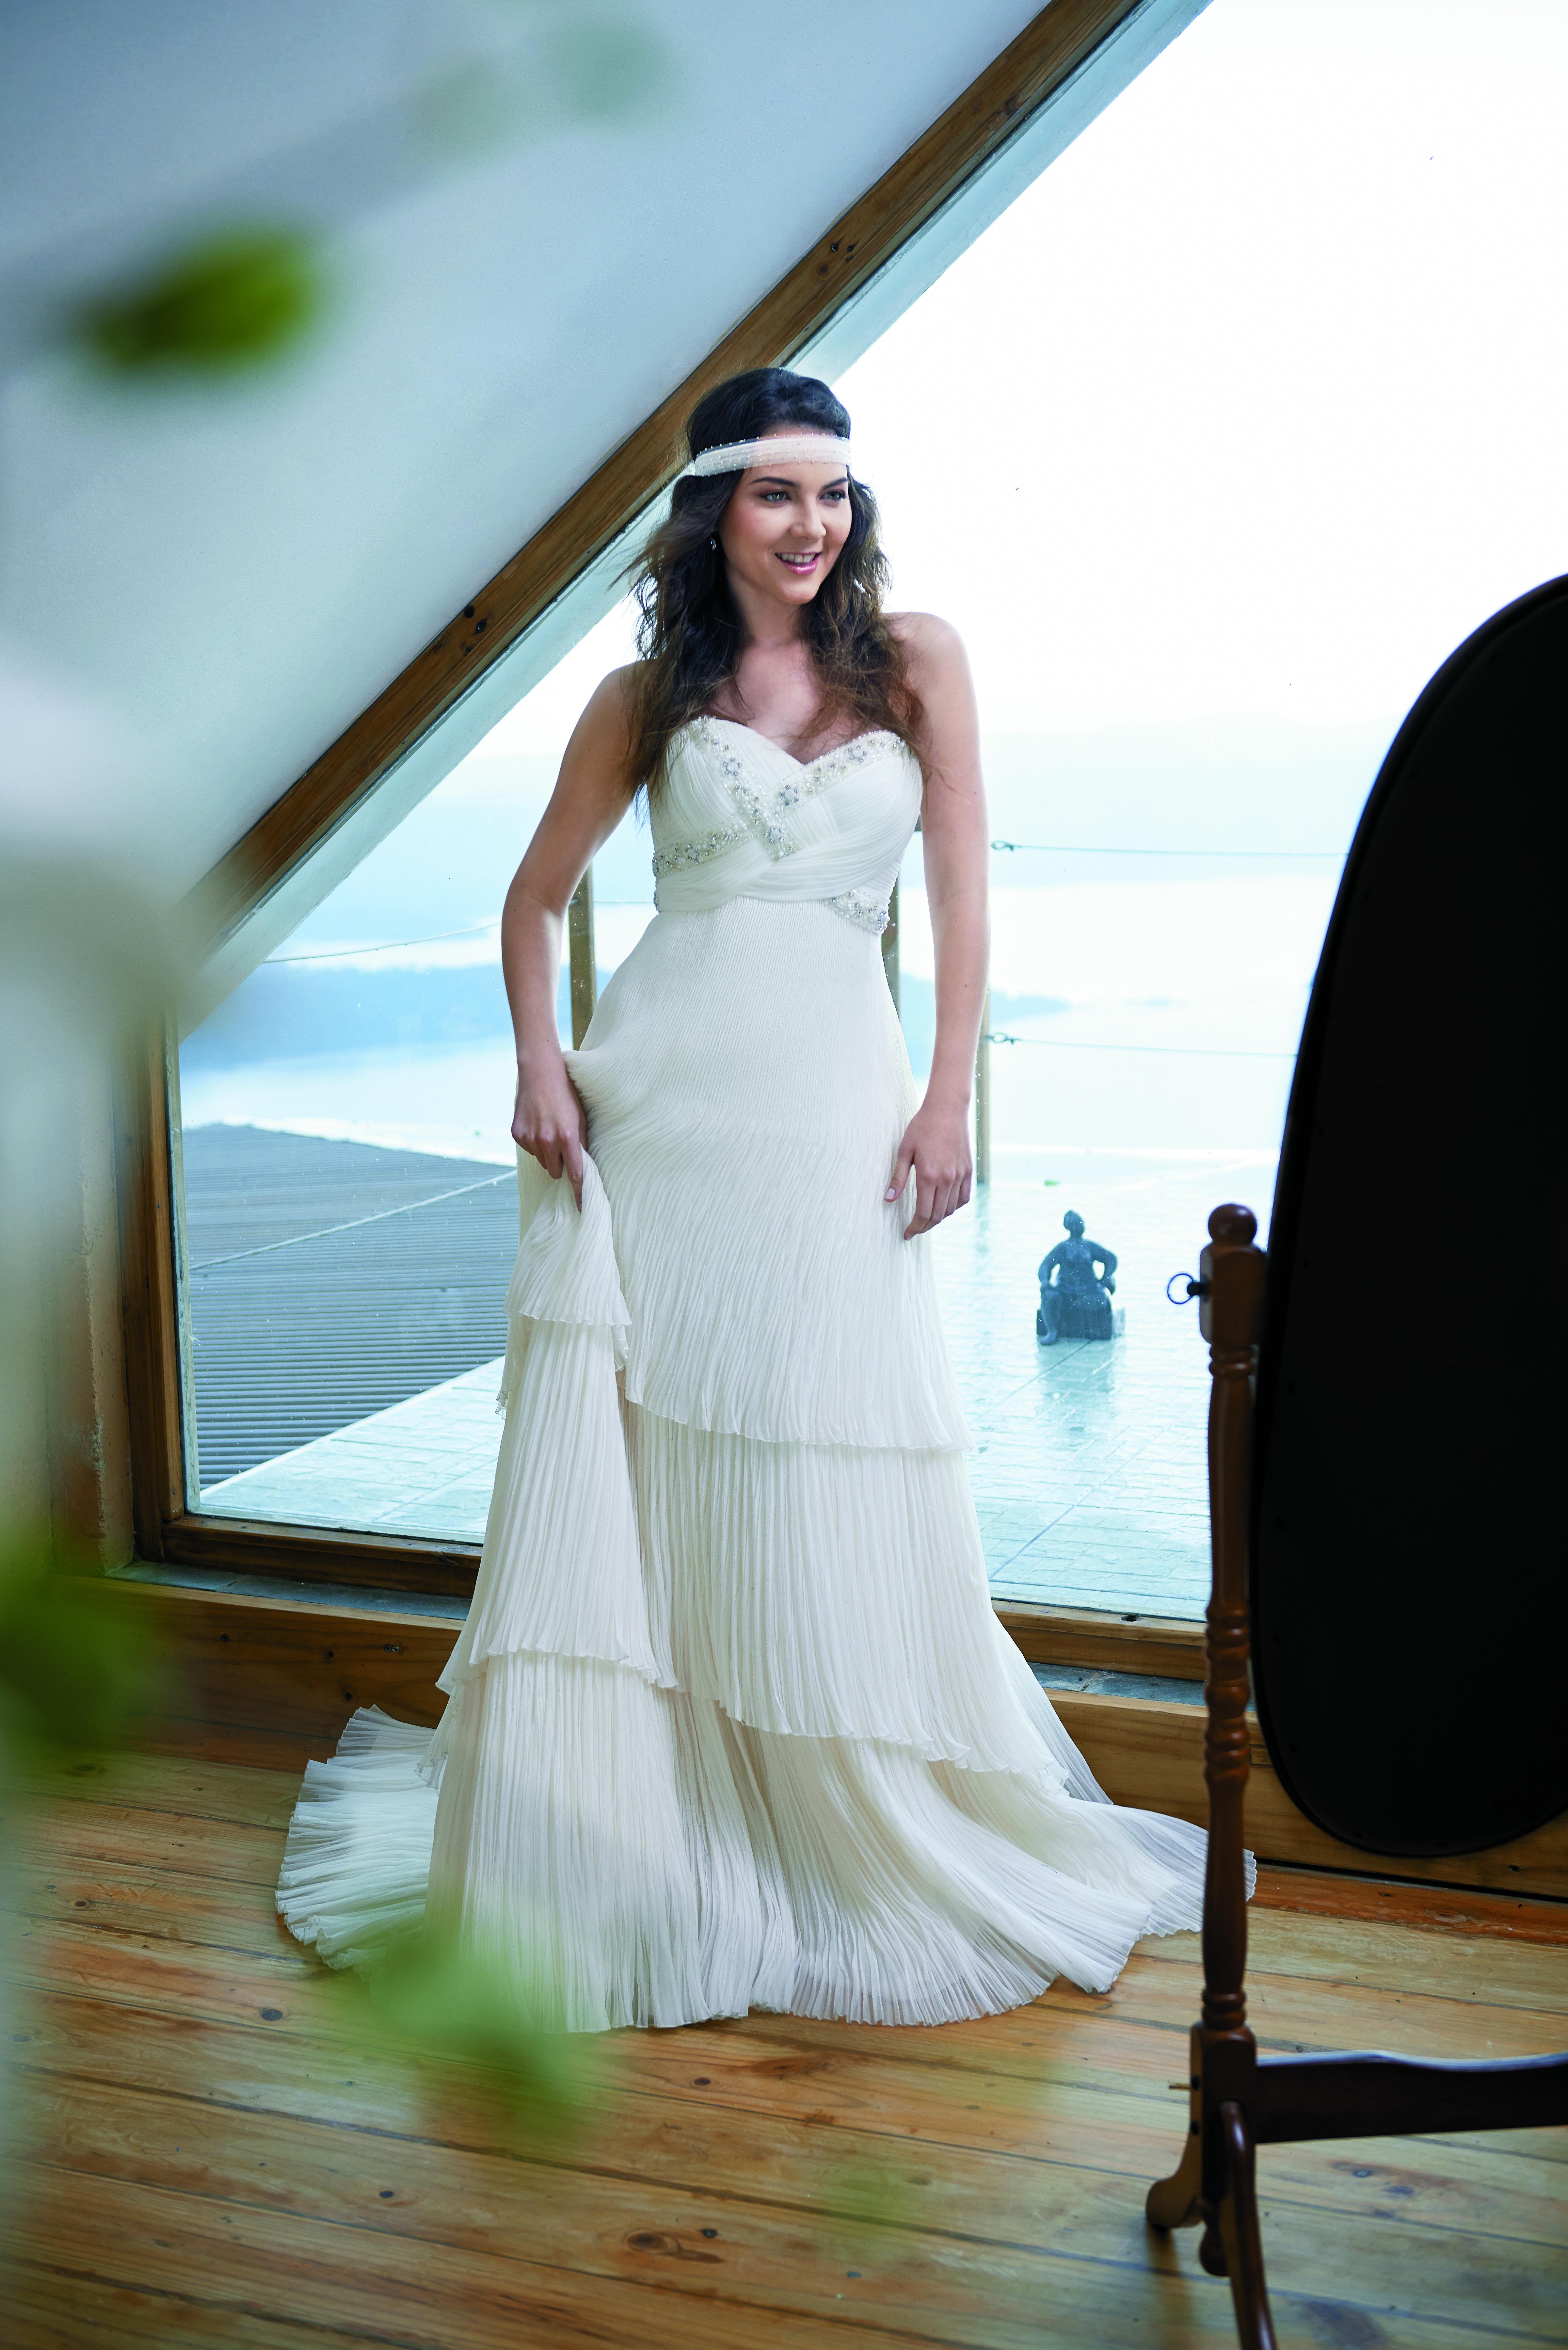 Vestidos de novia. De Kalas Boutique